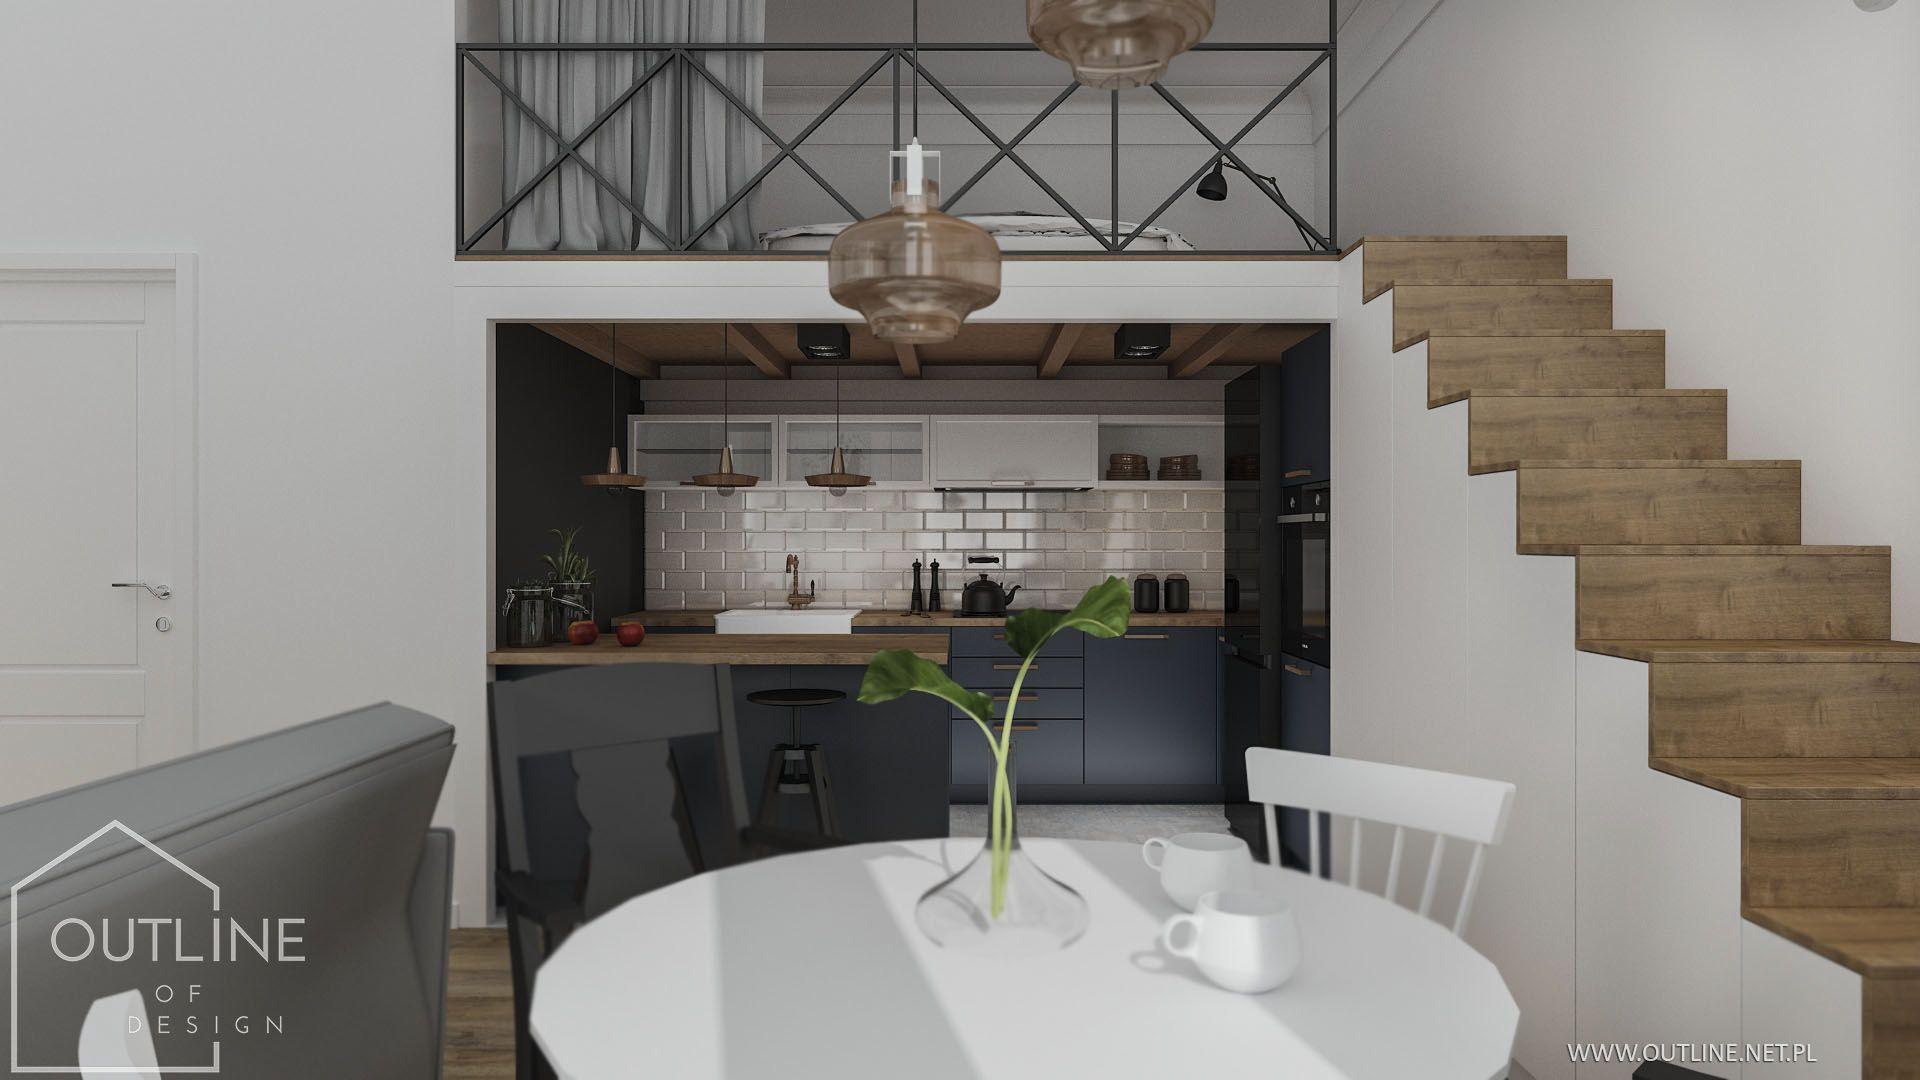 Kuchnia Pod Antresola Home Deco Home Decor House